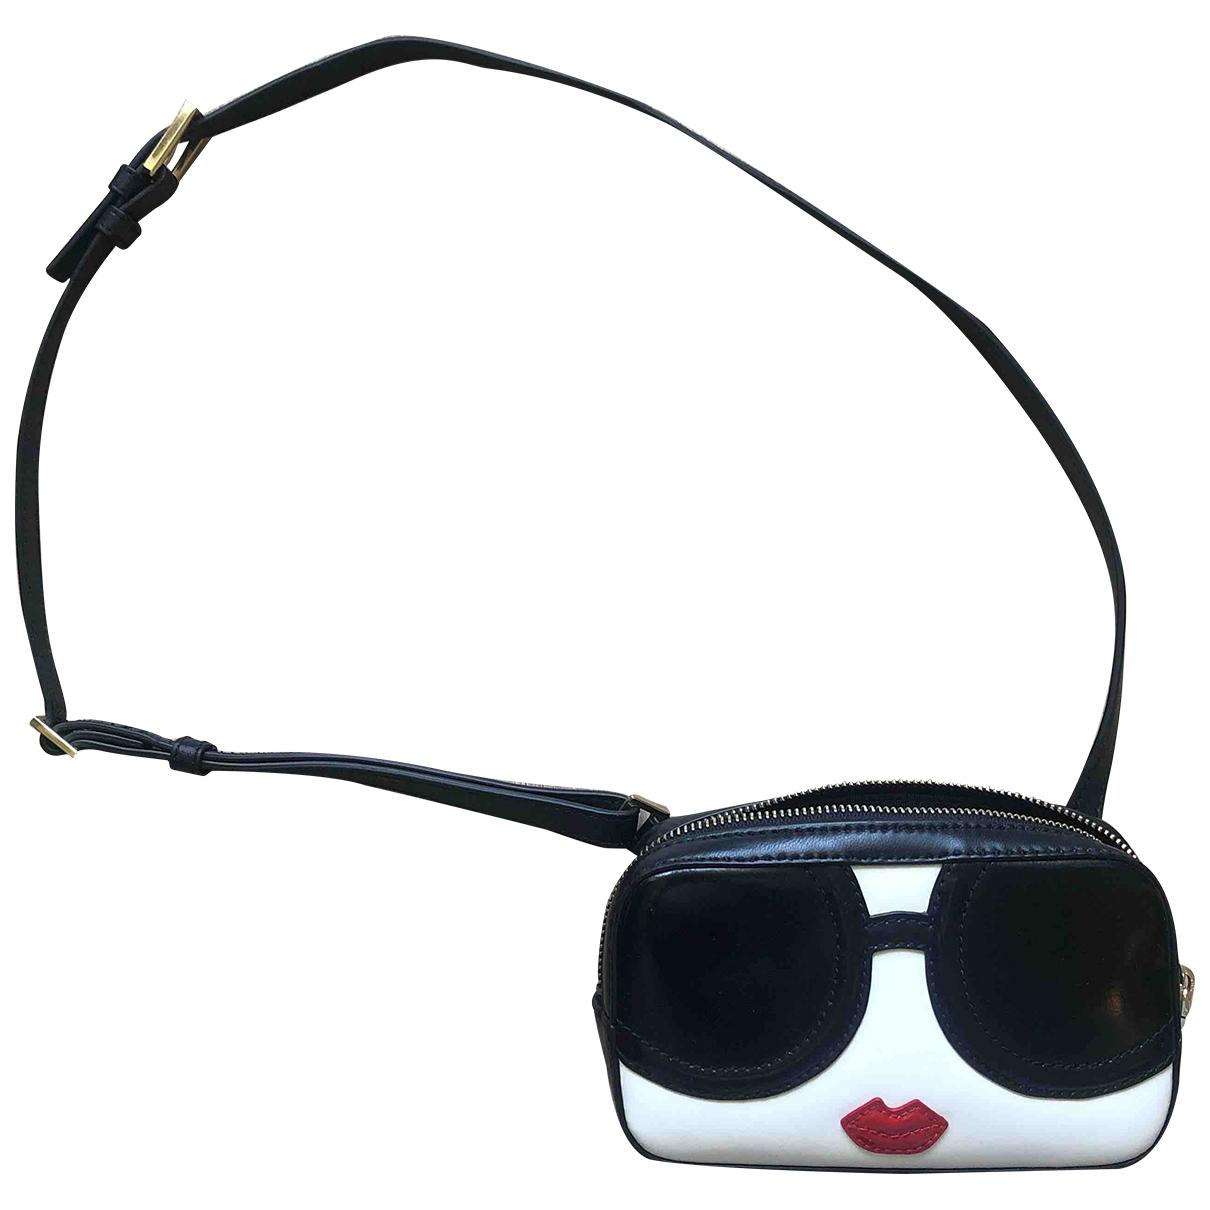 Alice & Olivia \N Black Leather handbag for Women \N